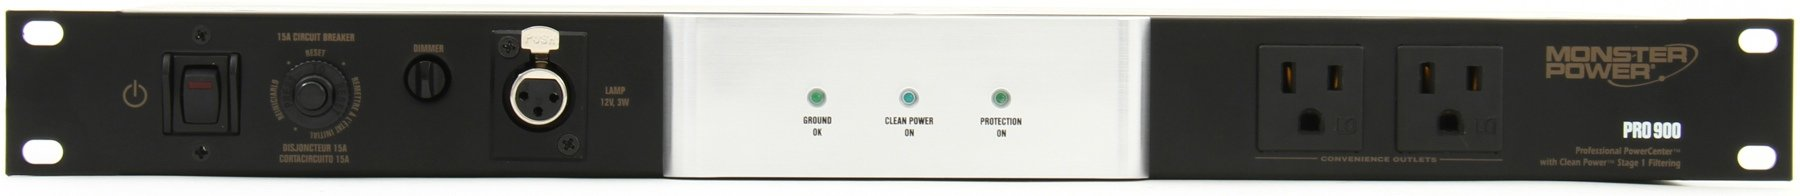 monster power powercenter pro 900 sweetwater